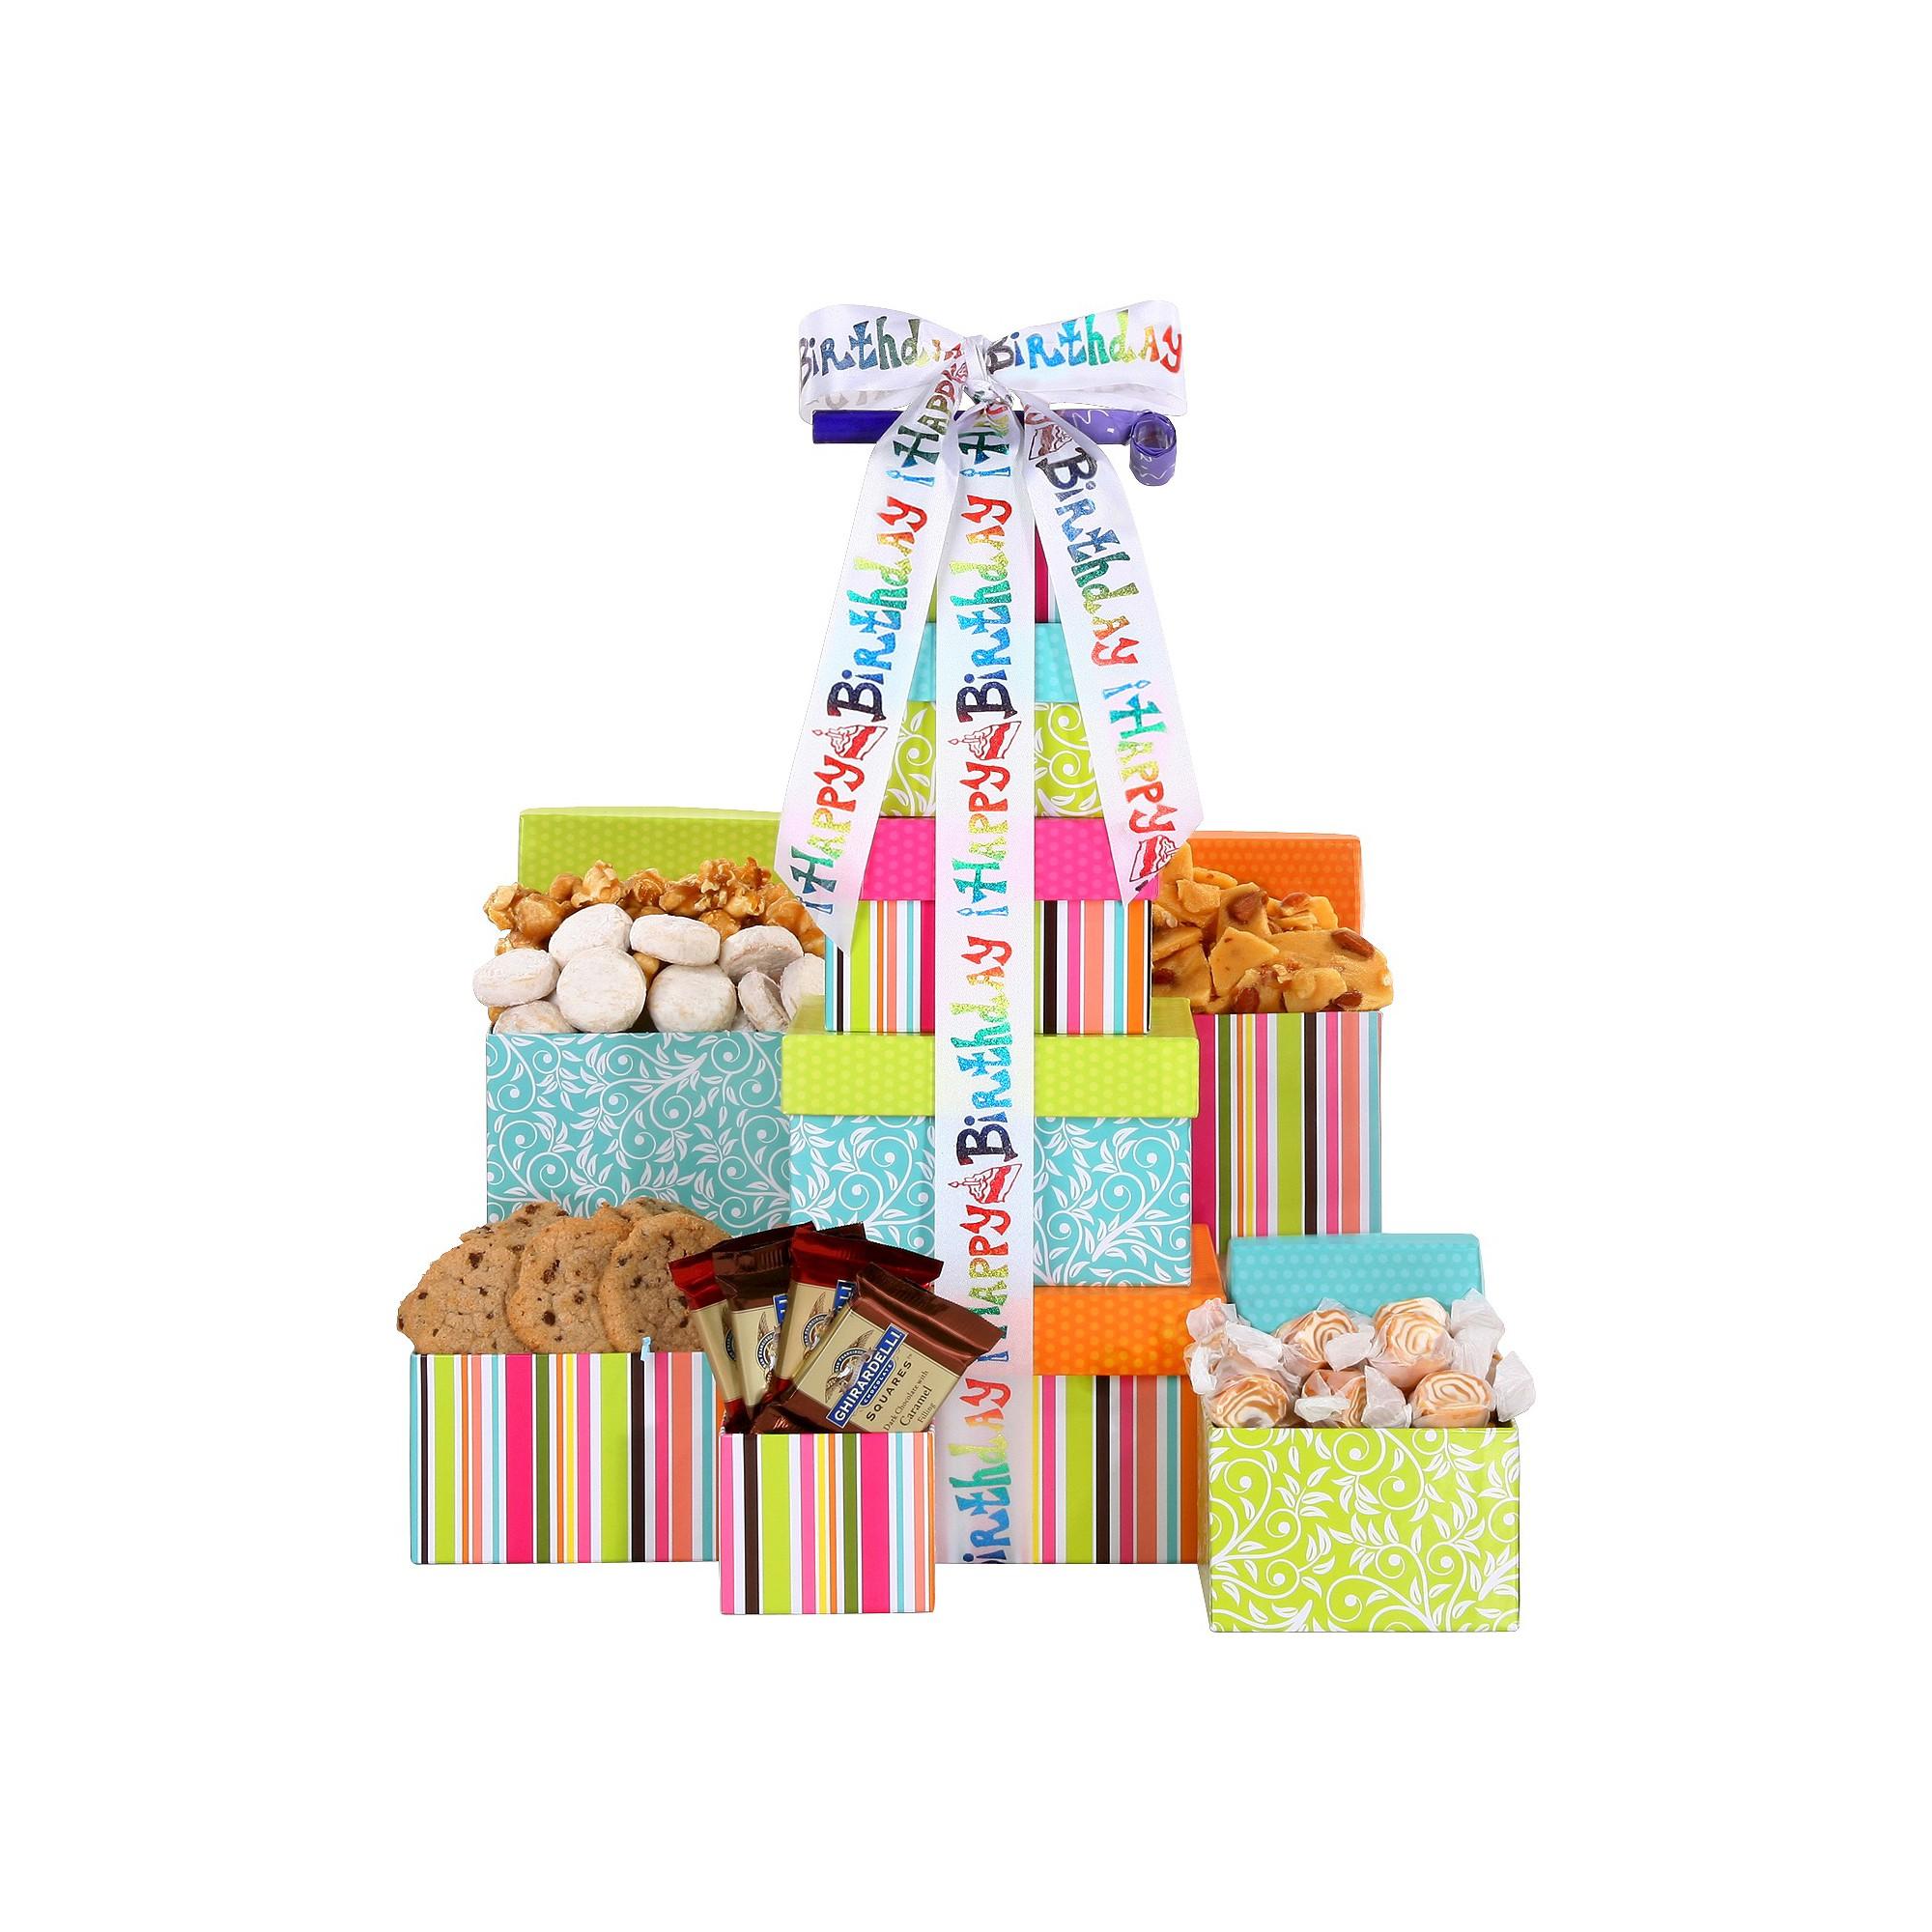 Alder creek gifts happy birthday treats 5tier gift tower